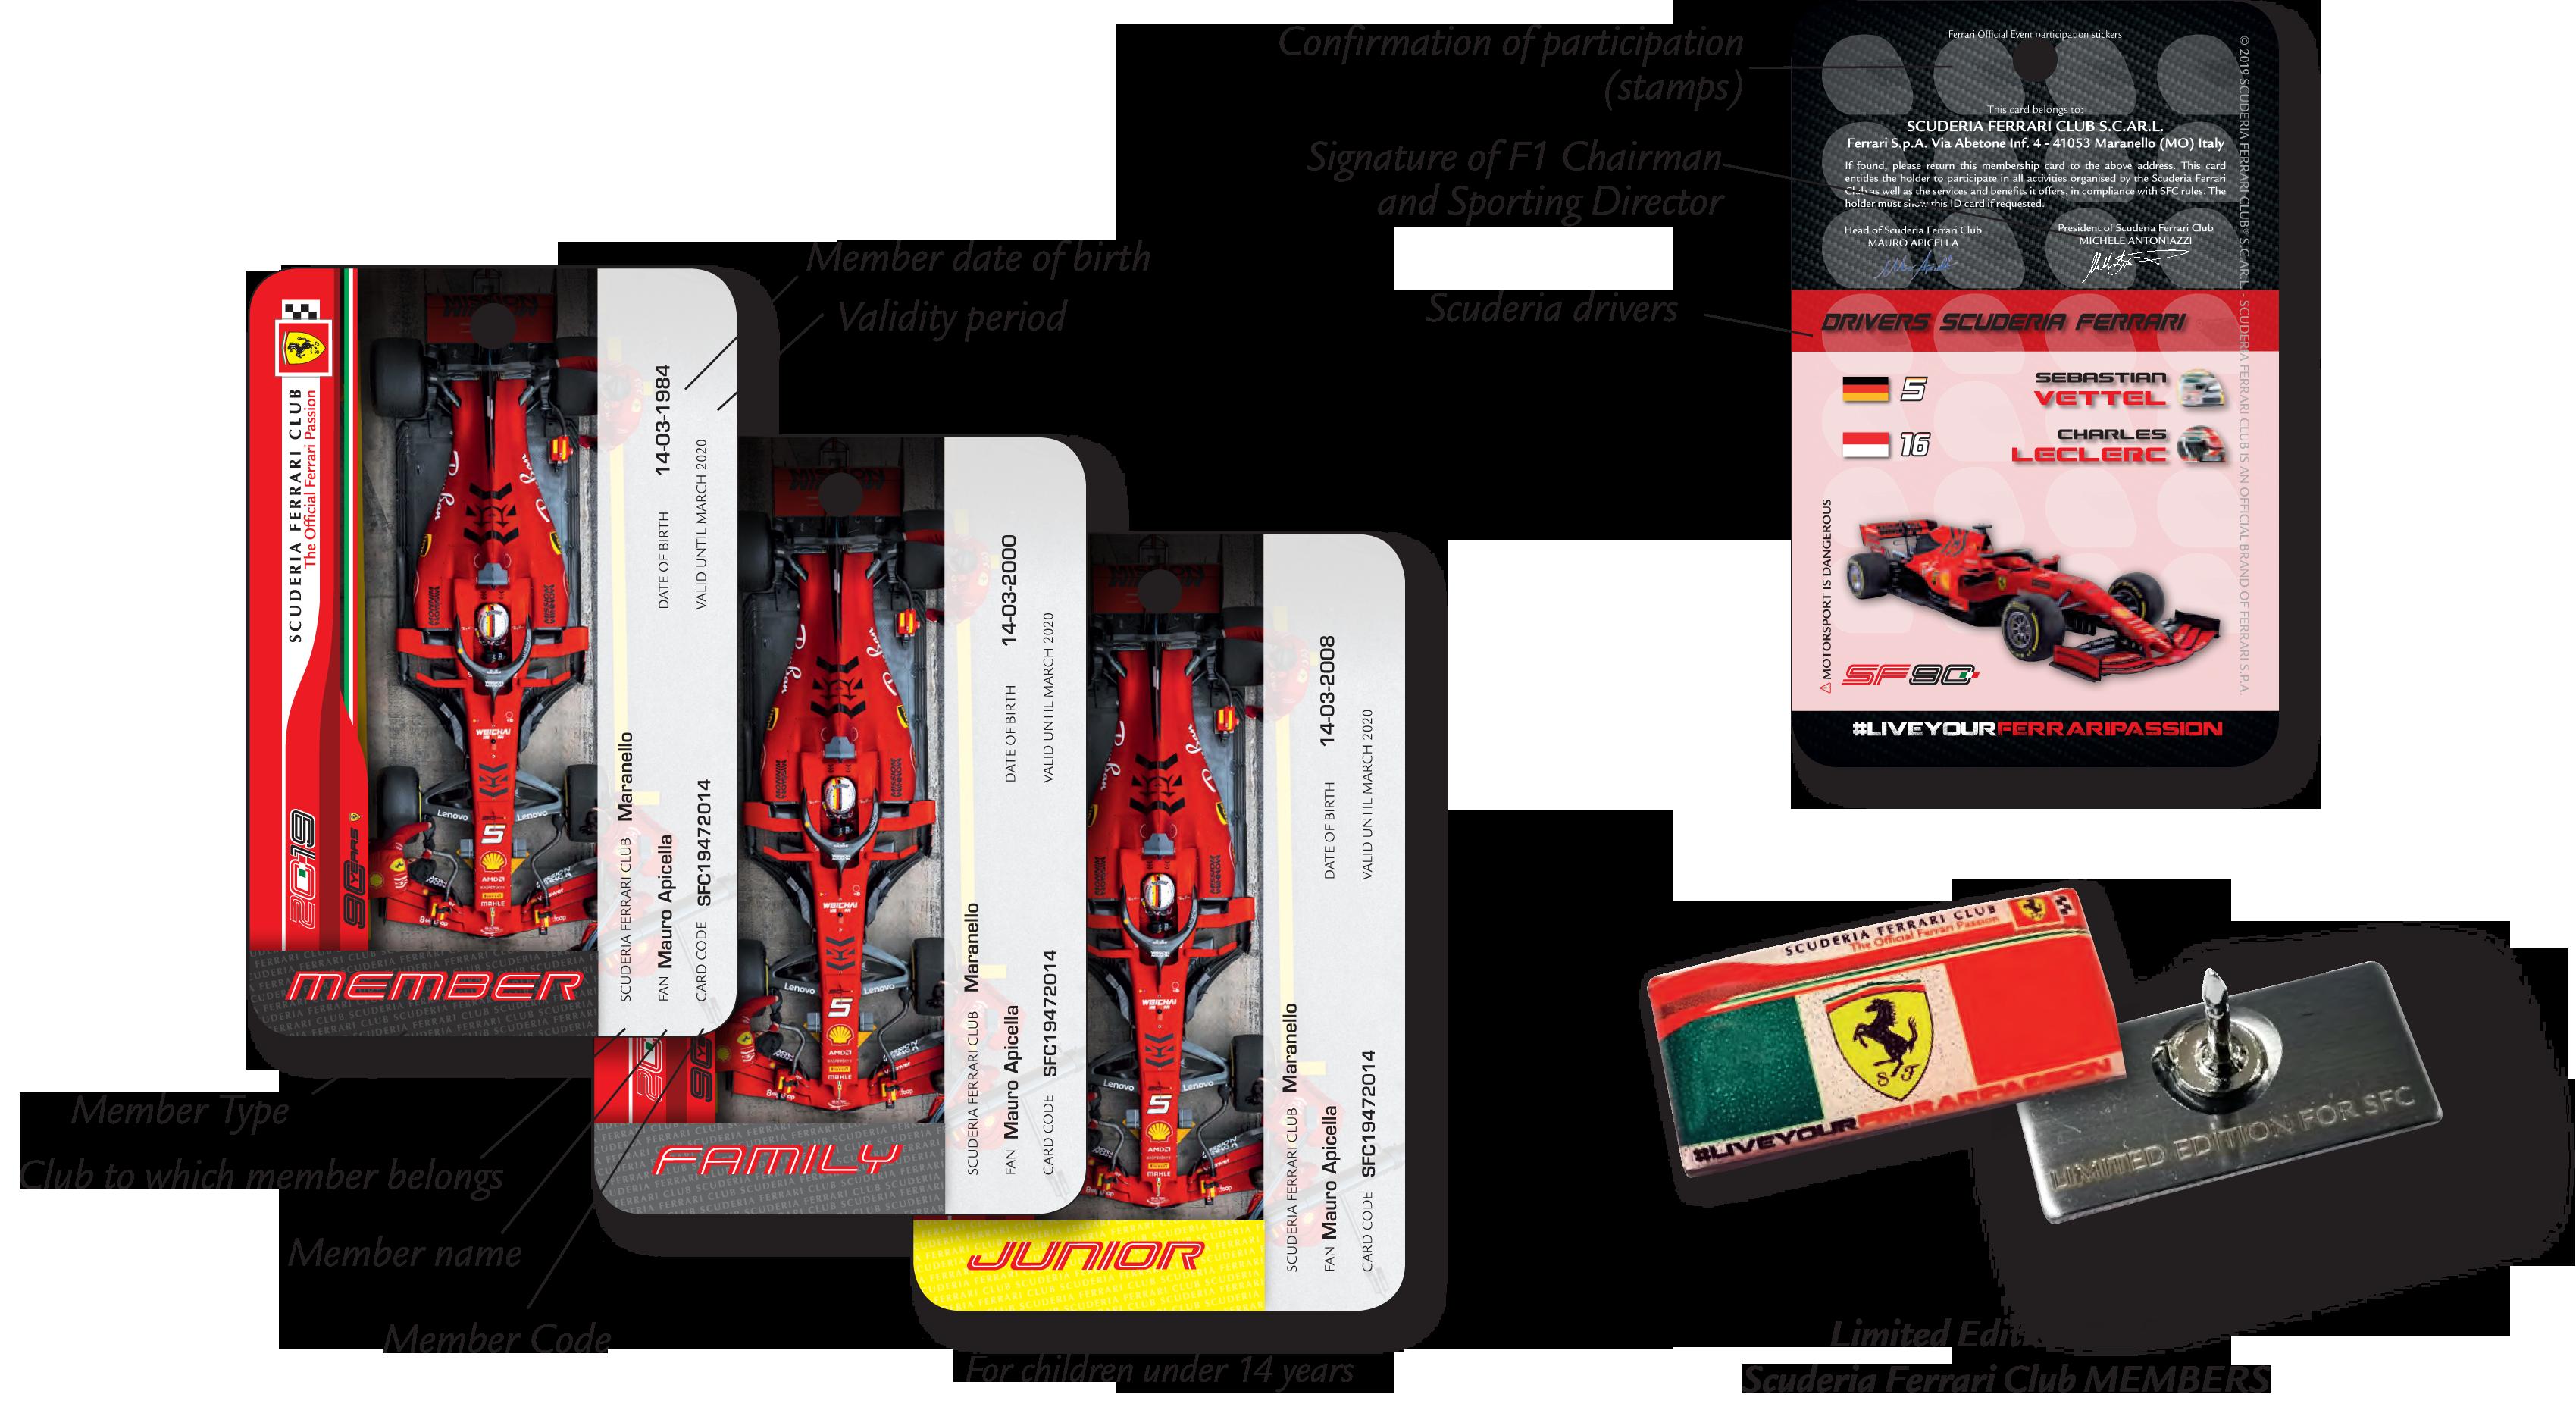 kit_2019_trasparente_card_en